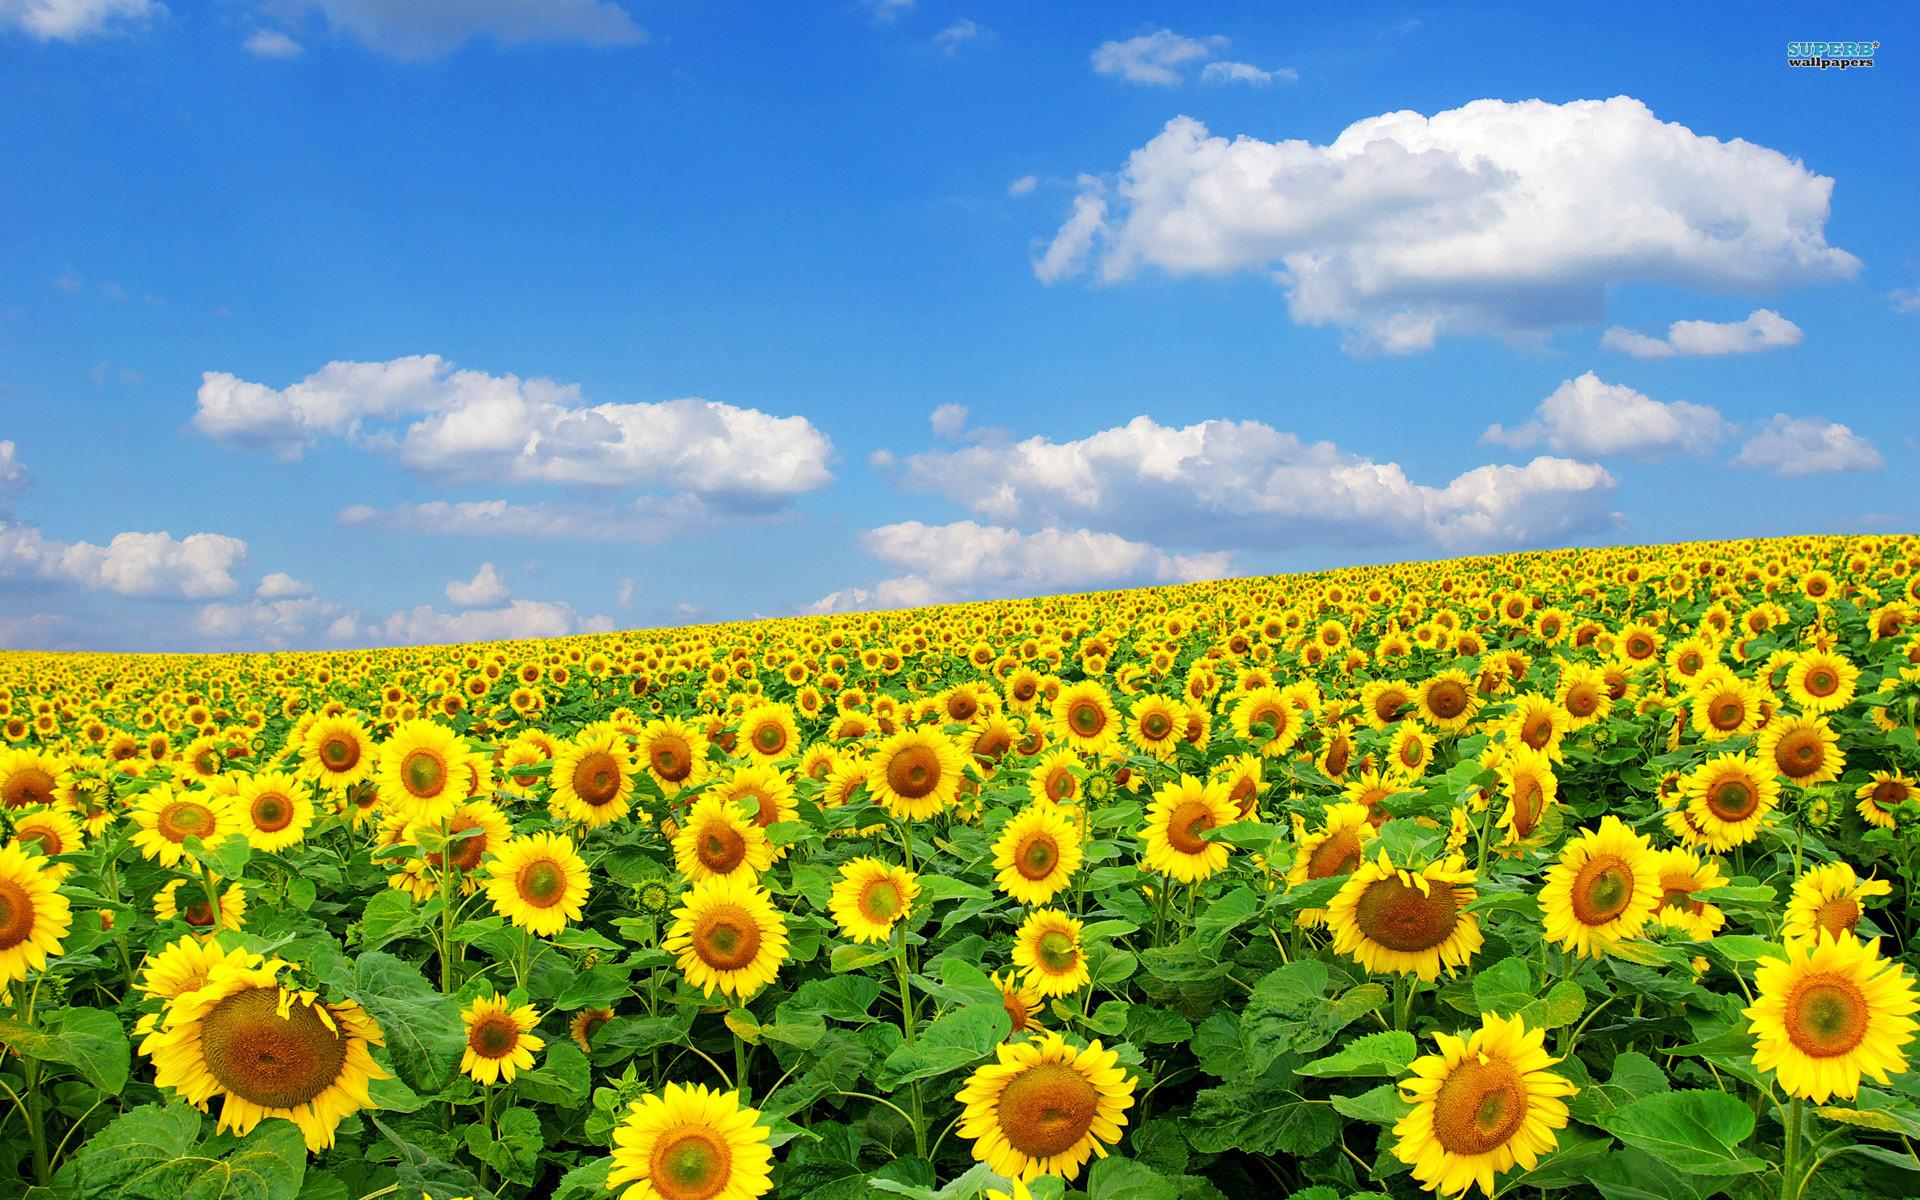 Sunflower Field Wallpaper HD Images #x2lf7t